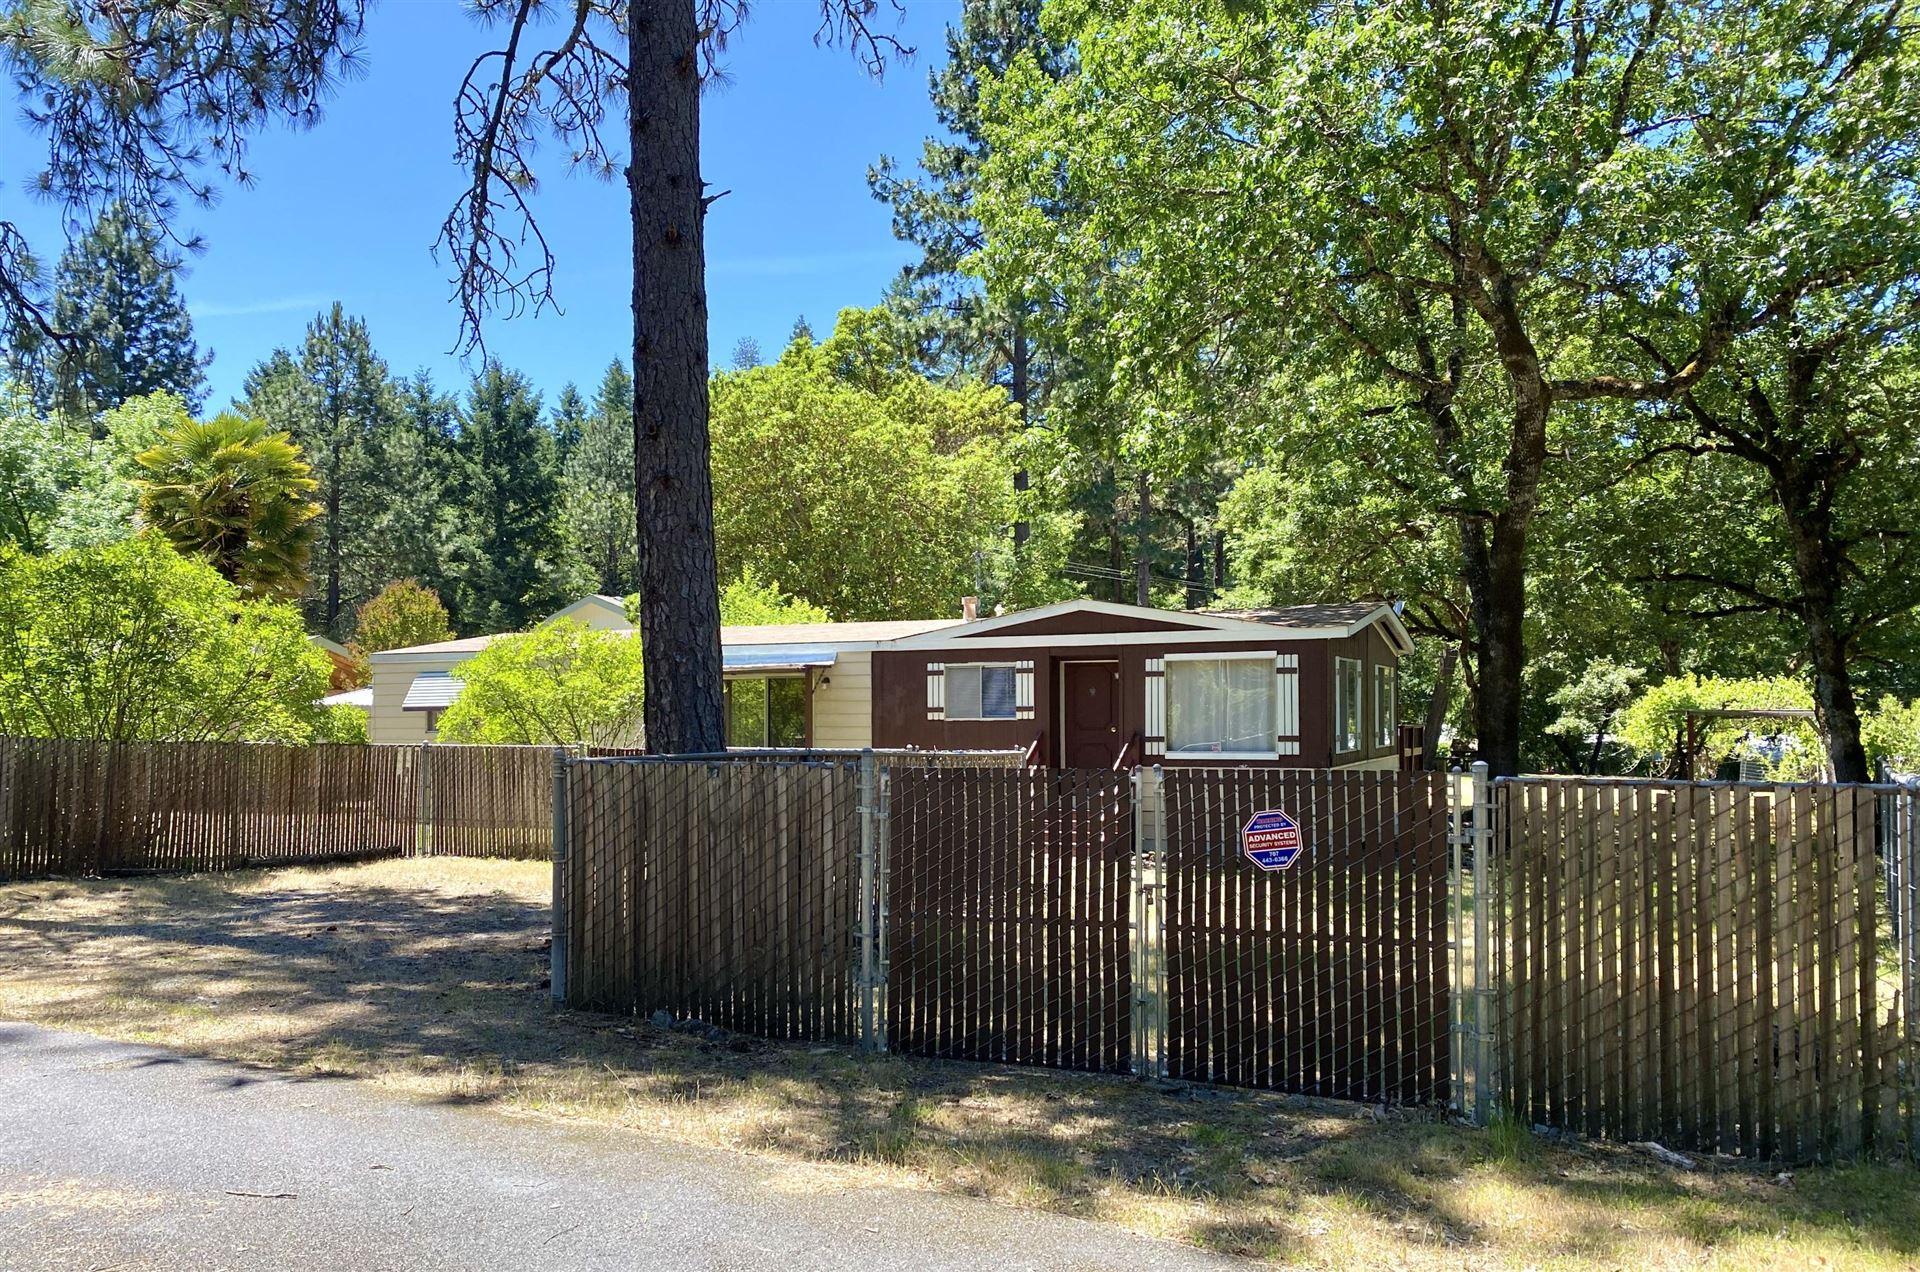 92 Oak Lane, Willow Creek, CA 95573 - MLS#: 256687